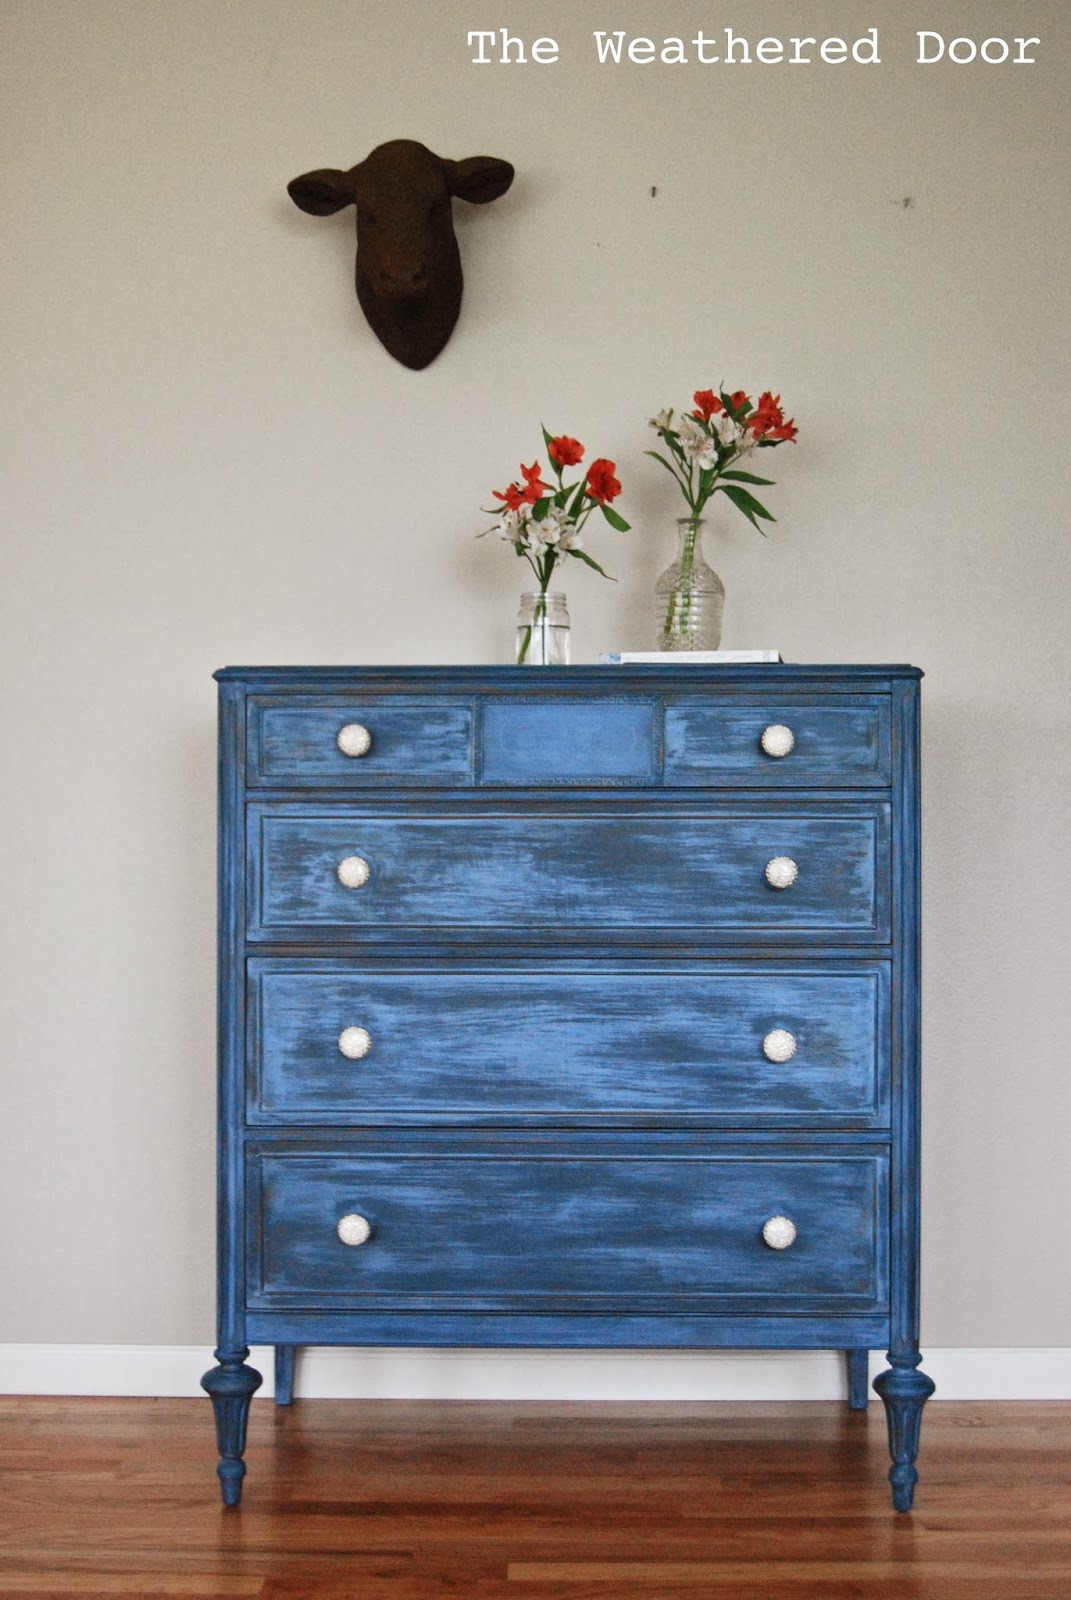 Antique Paint Colors Furniture - Antique Furniture Paint Colors Tyres2c - Antique  Paint Colors Furniture Antique - Antique Paint Colors Furniture Antique Furniture